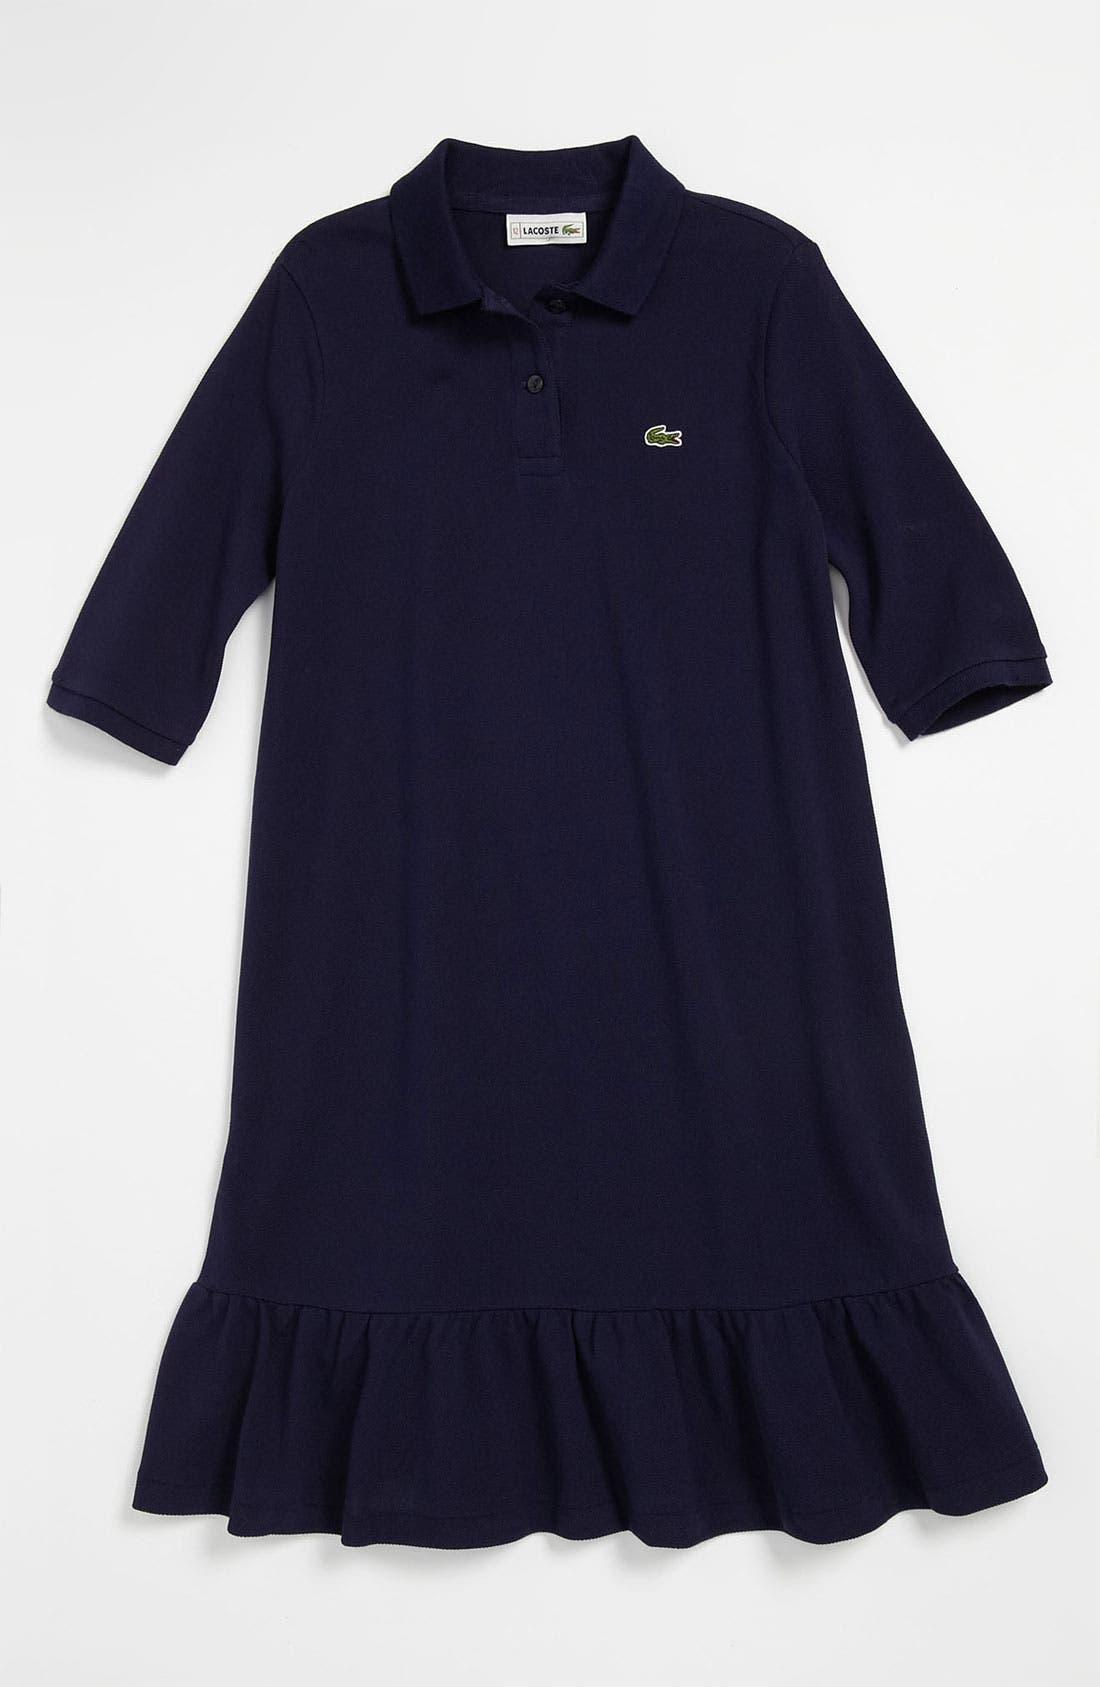 Main Image - Lacoste Ruffle Hem Polo Dress (Little Girls & Big Girls)